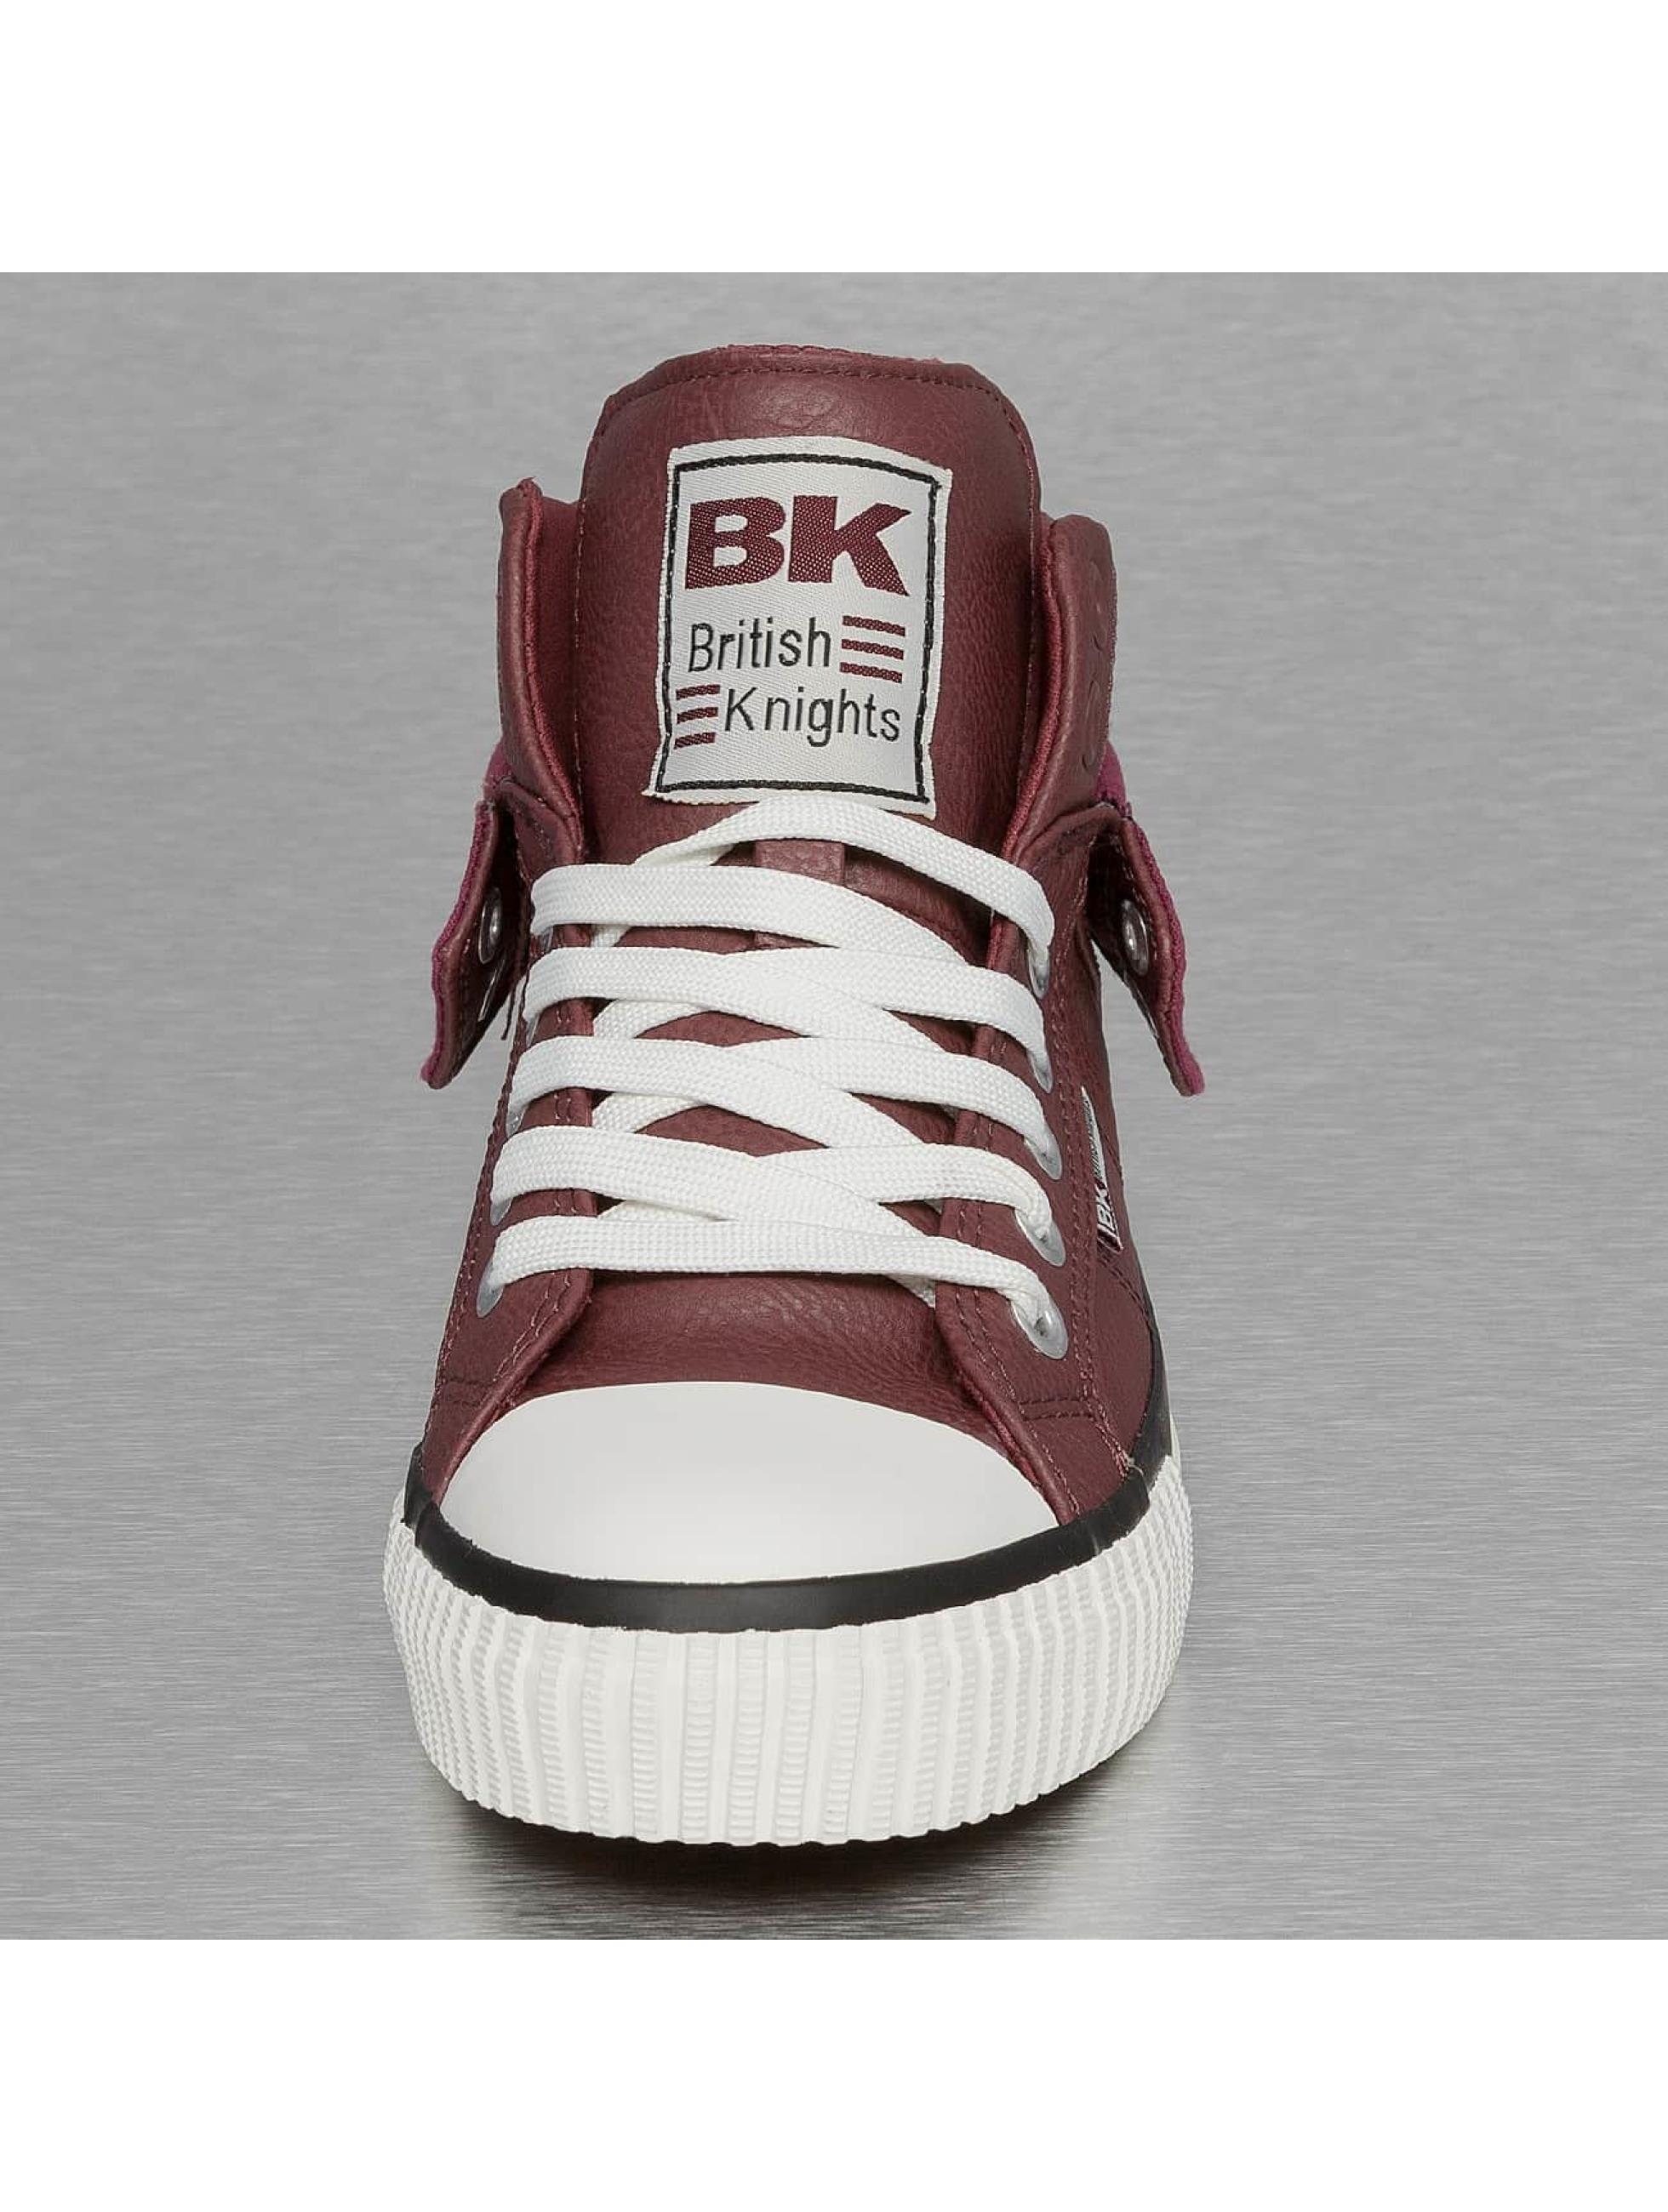 British Knights Sneakers Roco PU czerwony